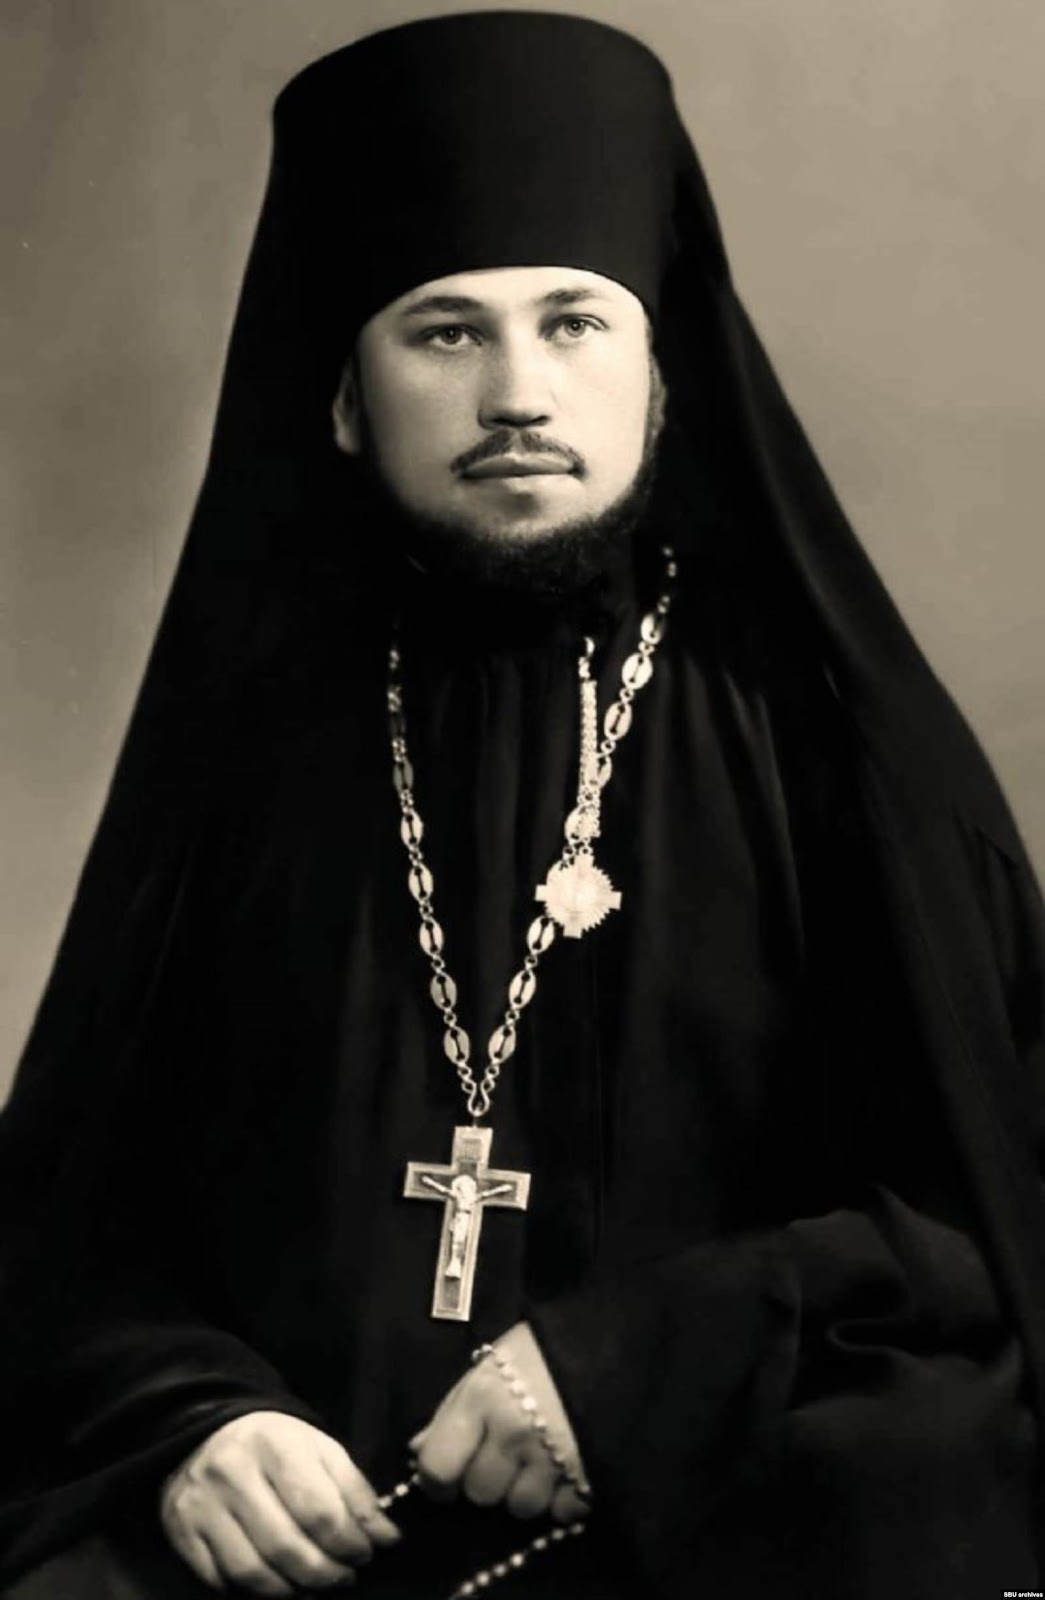 Владимир (Виктор Сабодан) в молодости